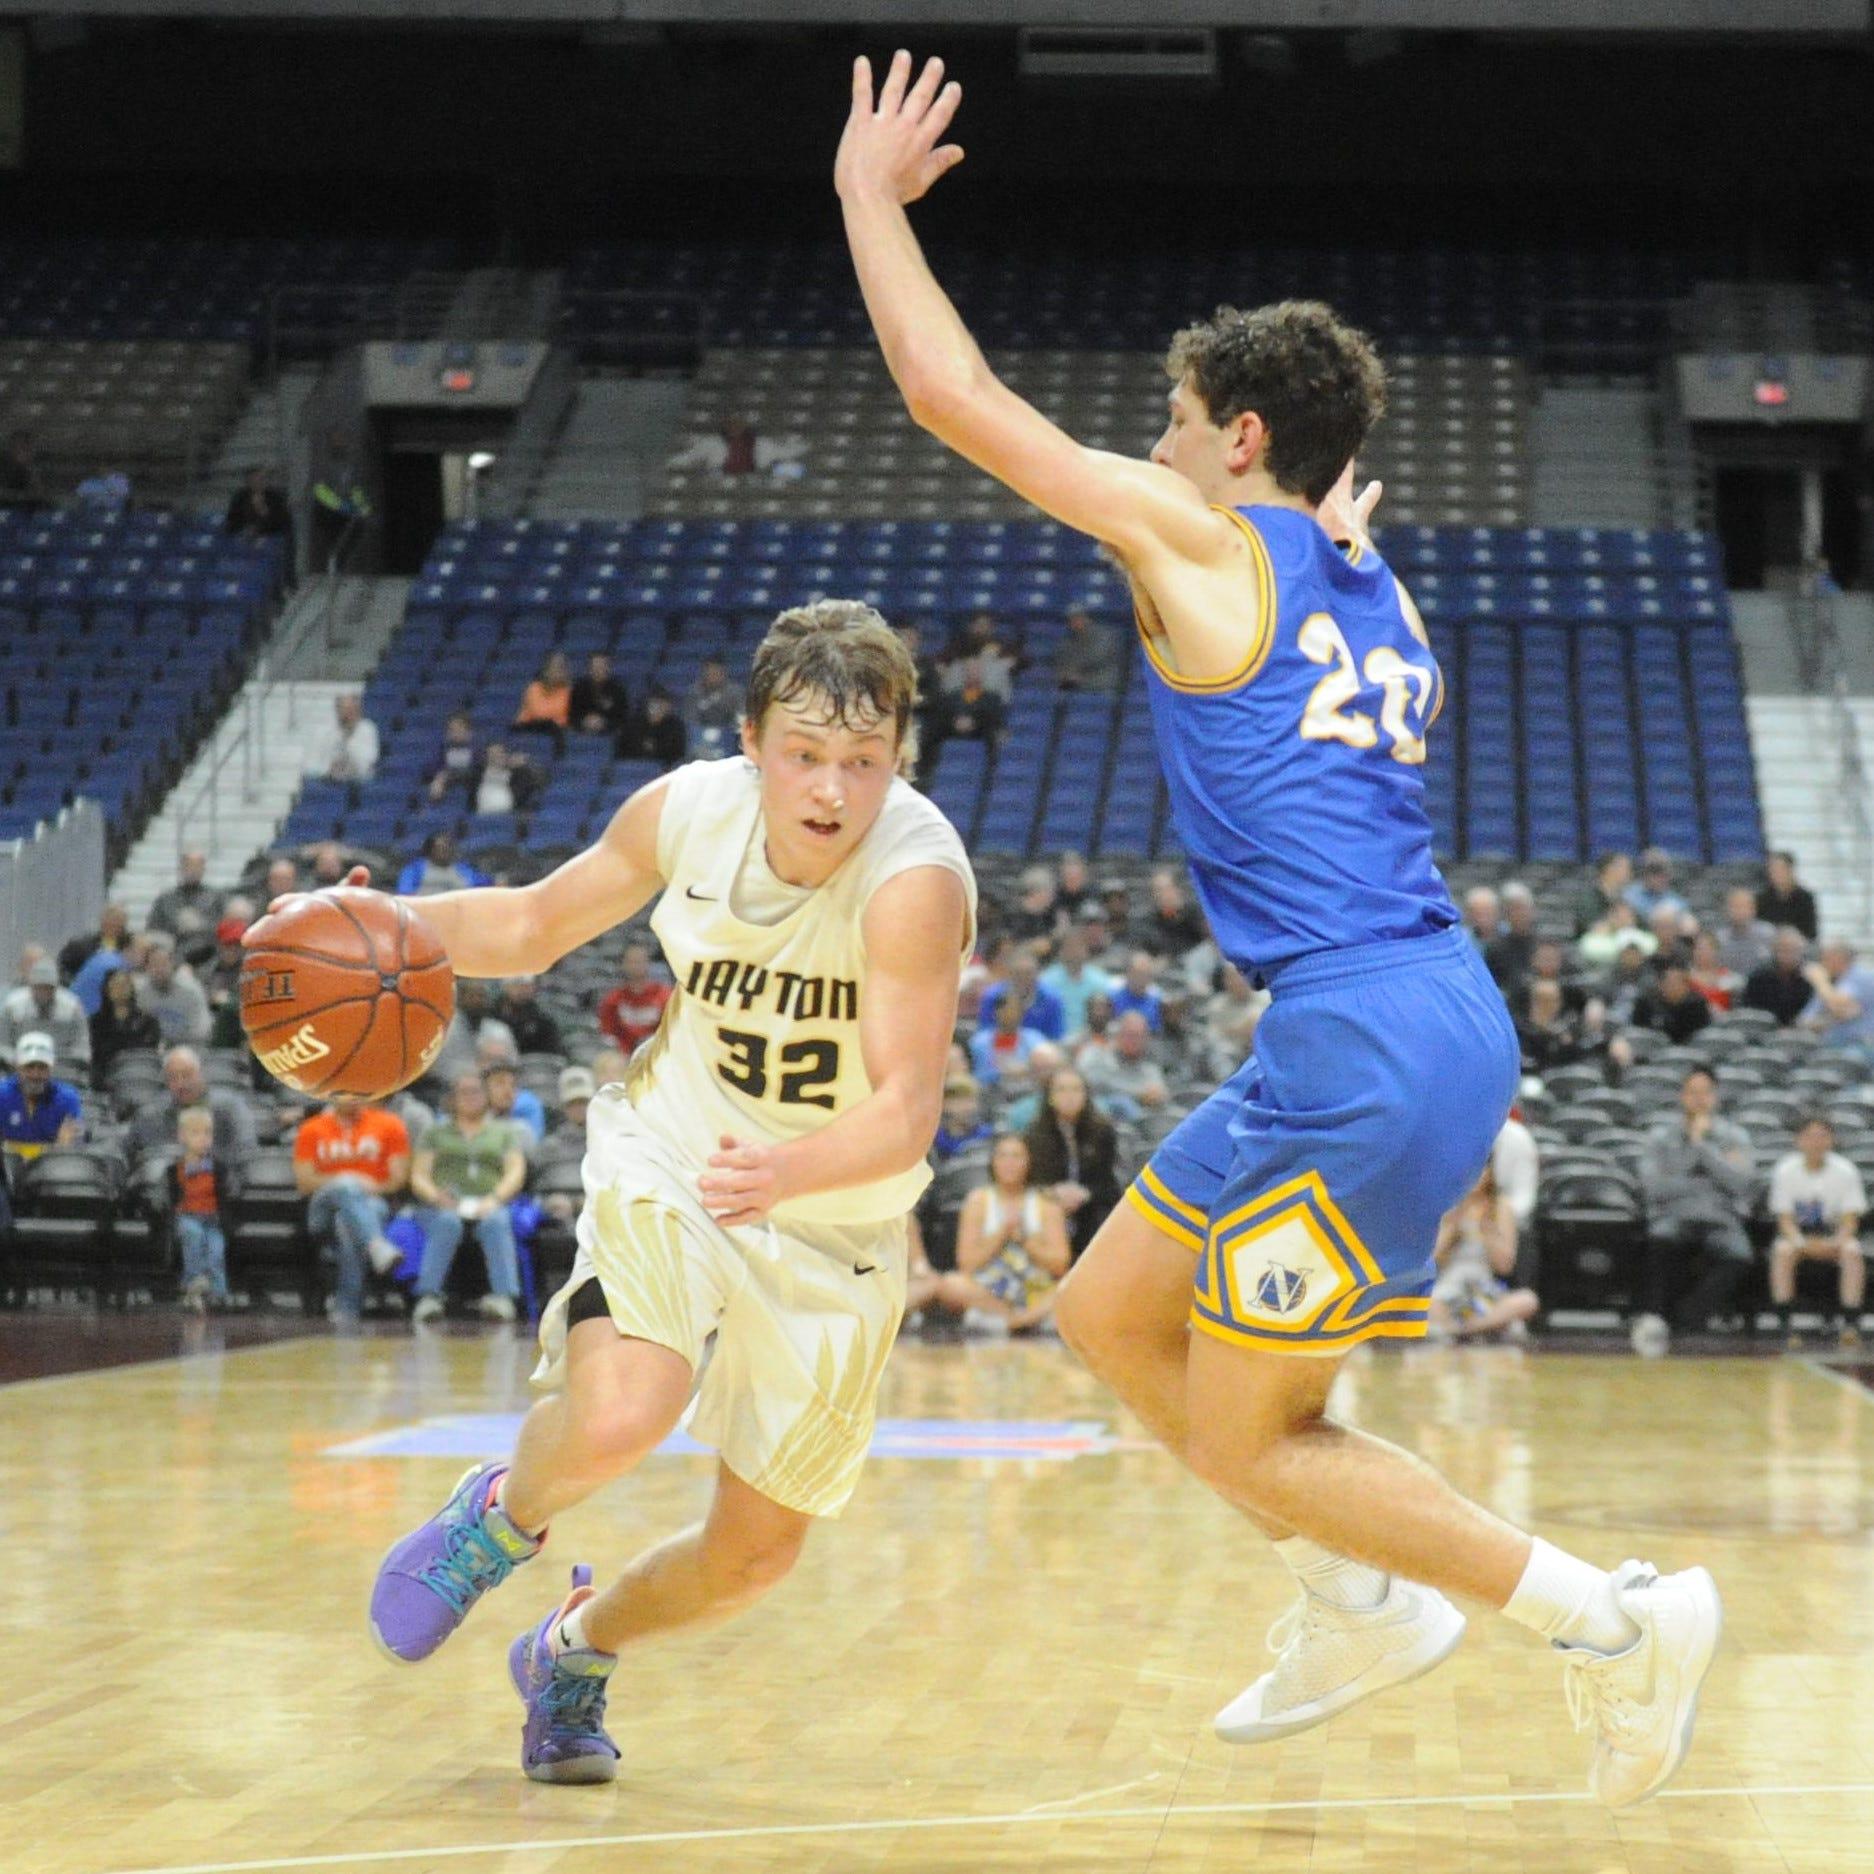 Tye Scogin buzzer-beater downs Nazareth, sends Jayton boys basketball to first state final